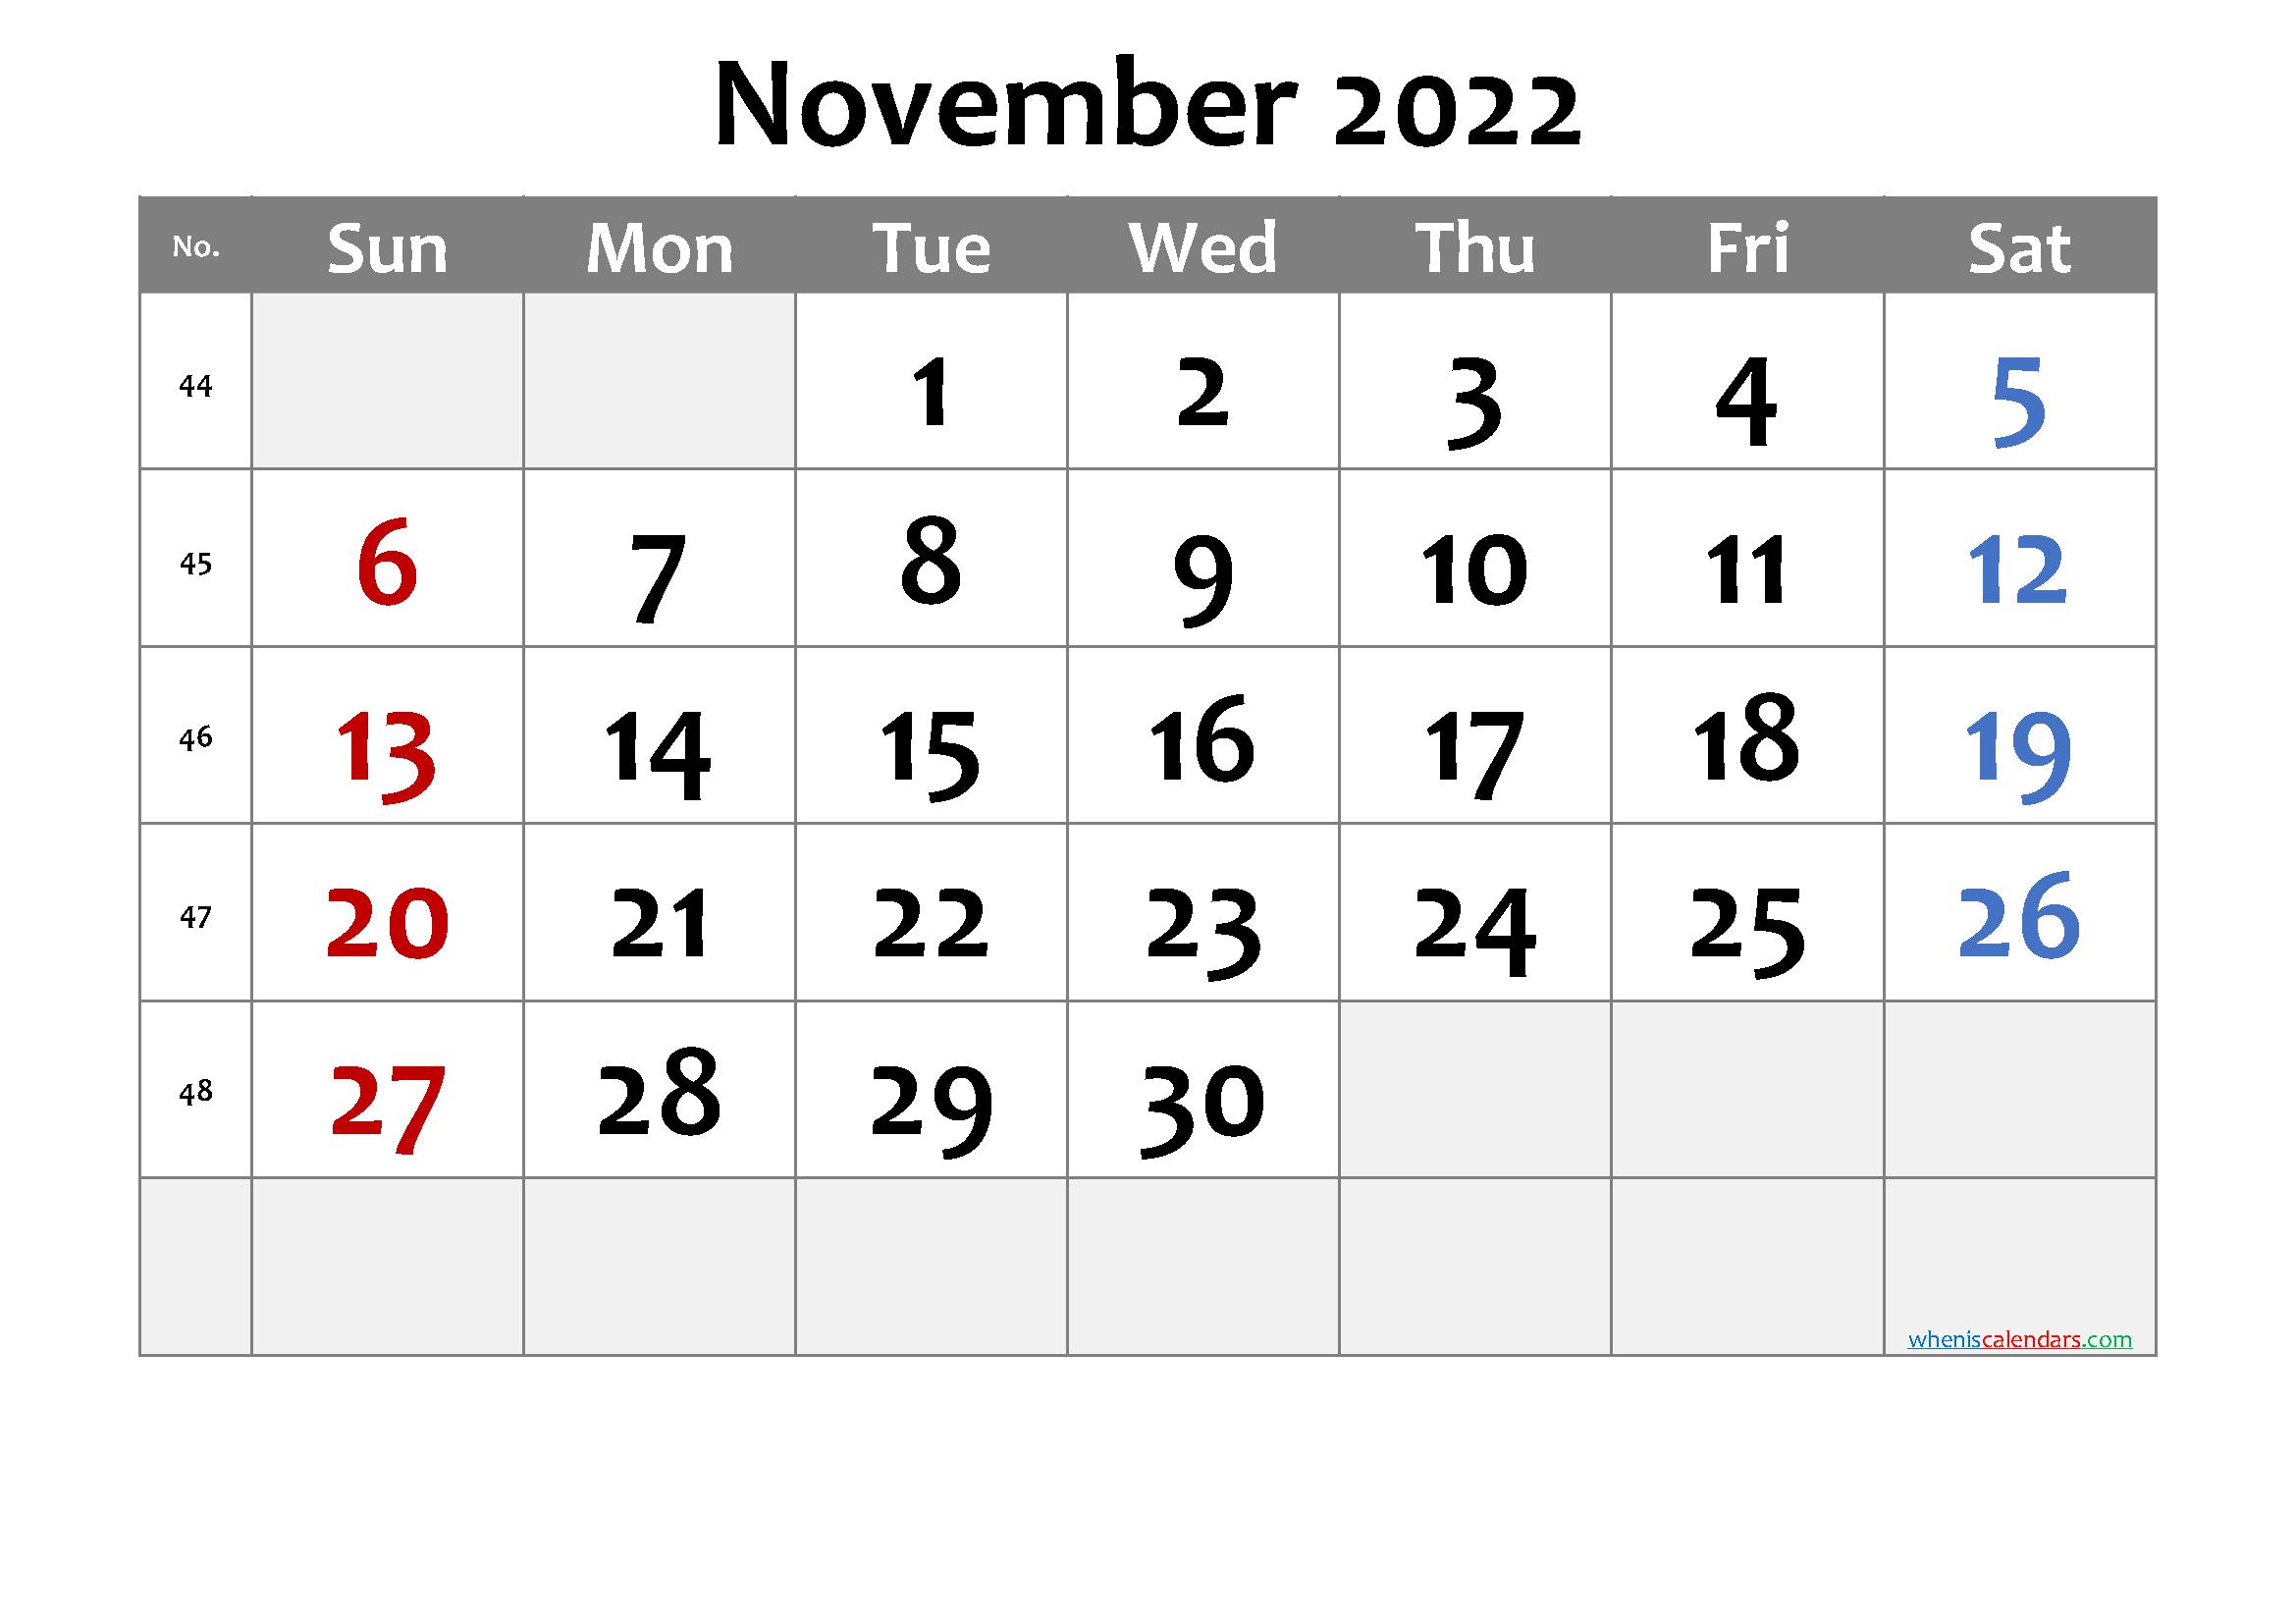 November 2022 Printable Calendar.November 2022 Printable Calendar 6 Templates Printable Calendar Template Printable Calendar July Calendar Printables